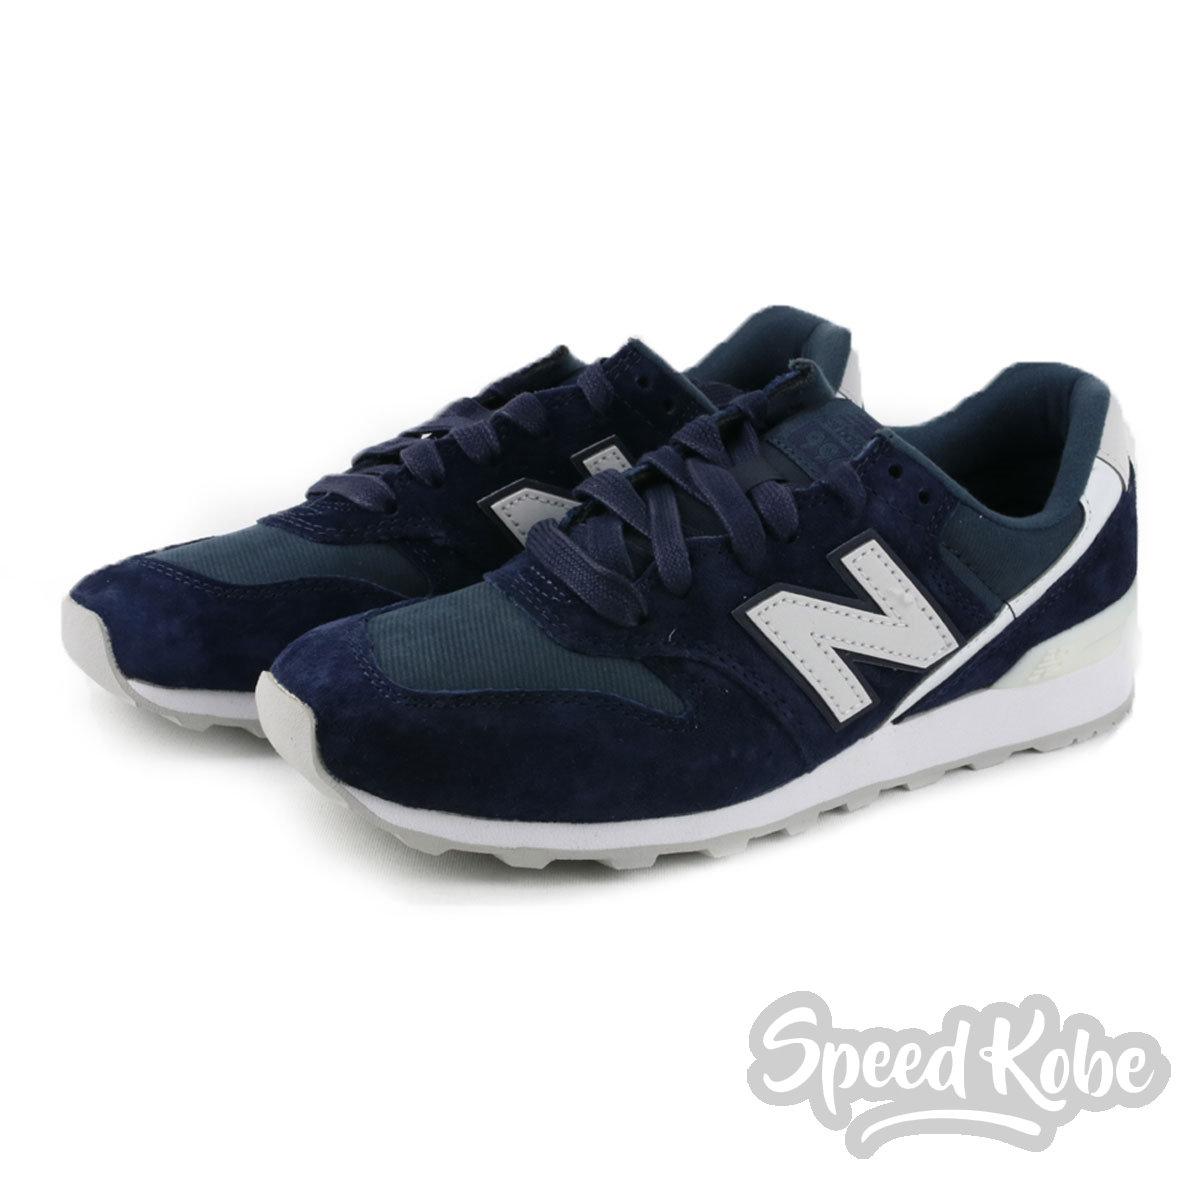 New Balance慢跑鞋996海軍深藍麂皮運動休閒女鞋WR996CGN Speedkobe